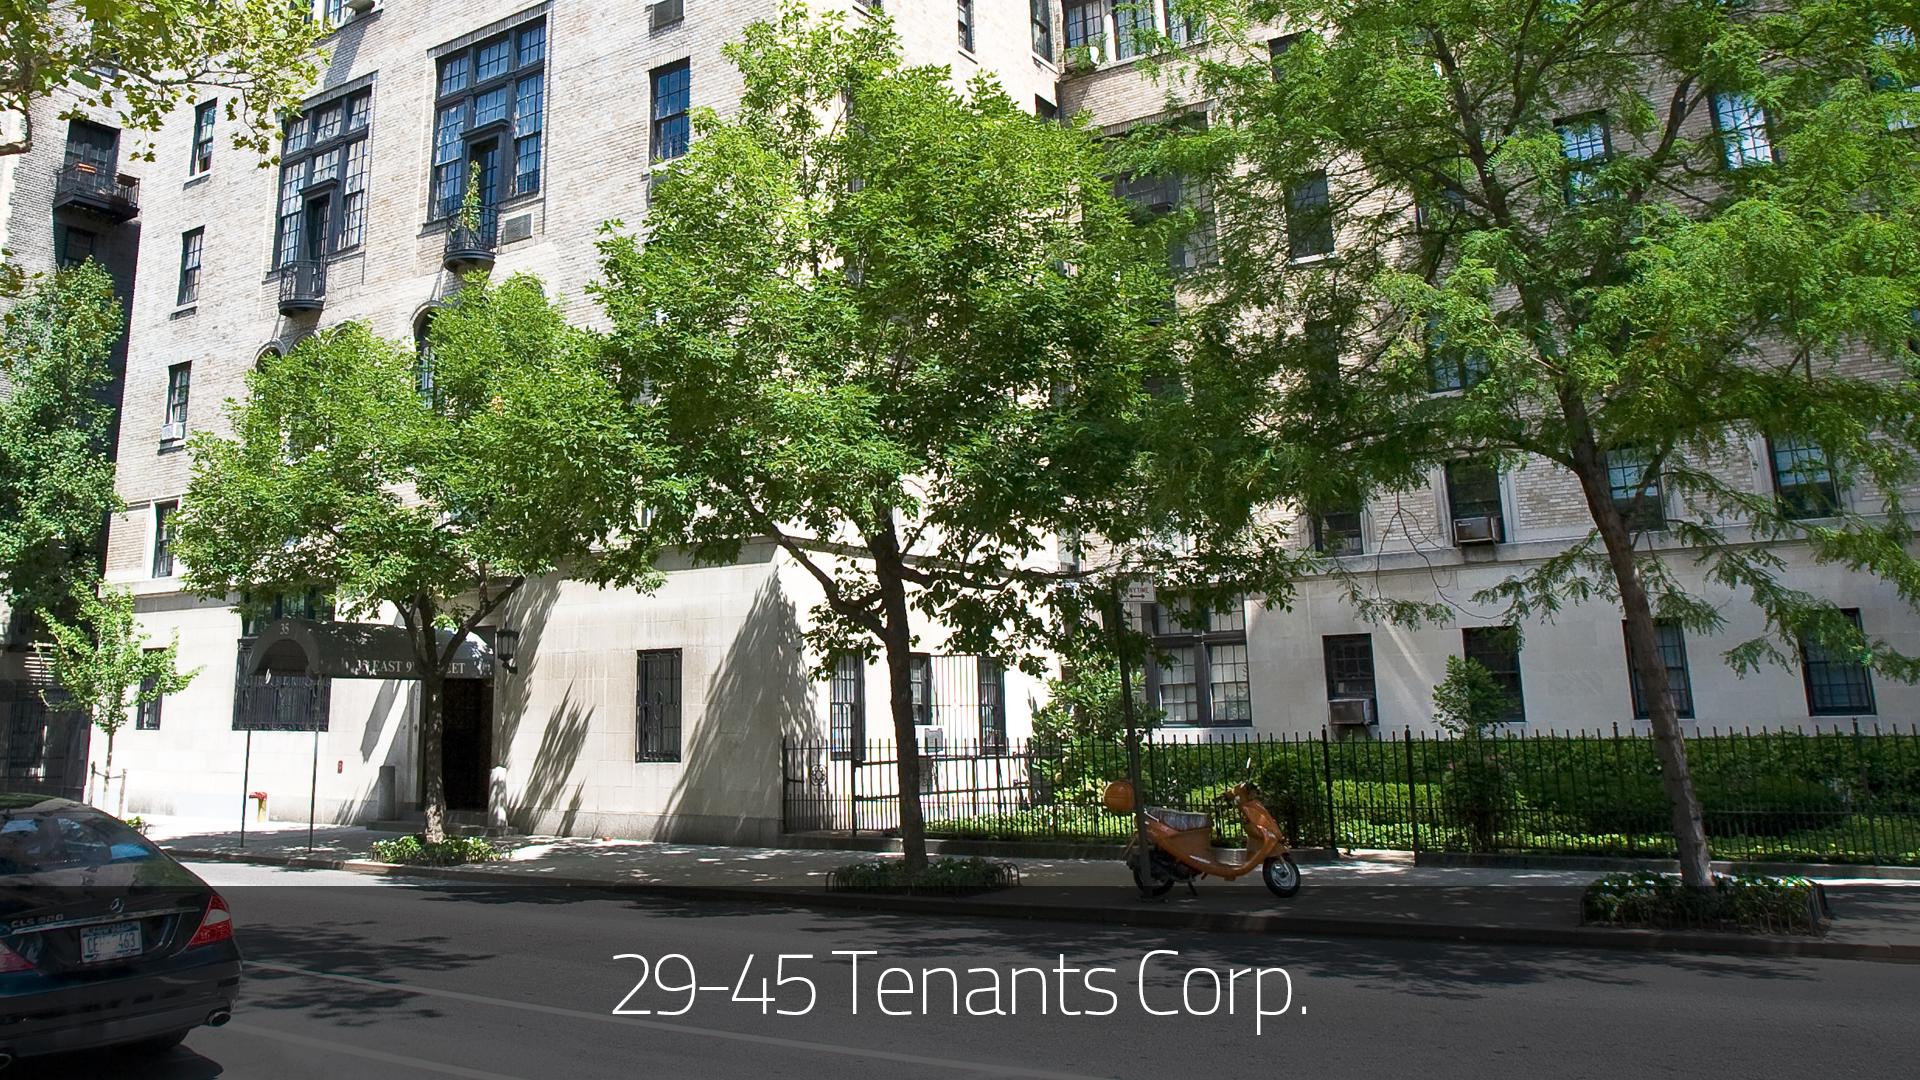 29 45 tenants corp